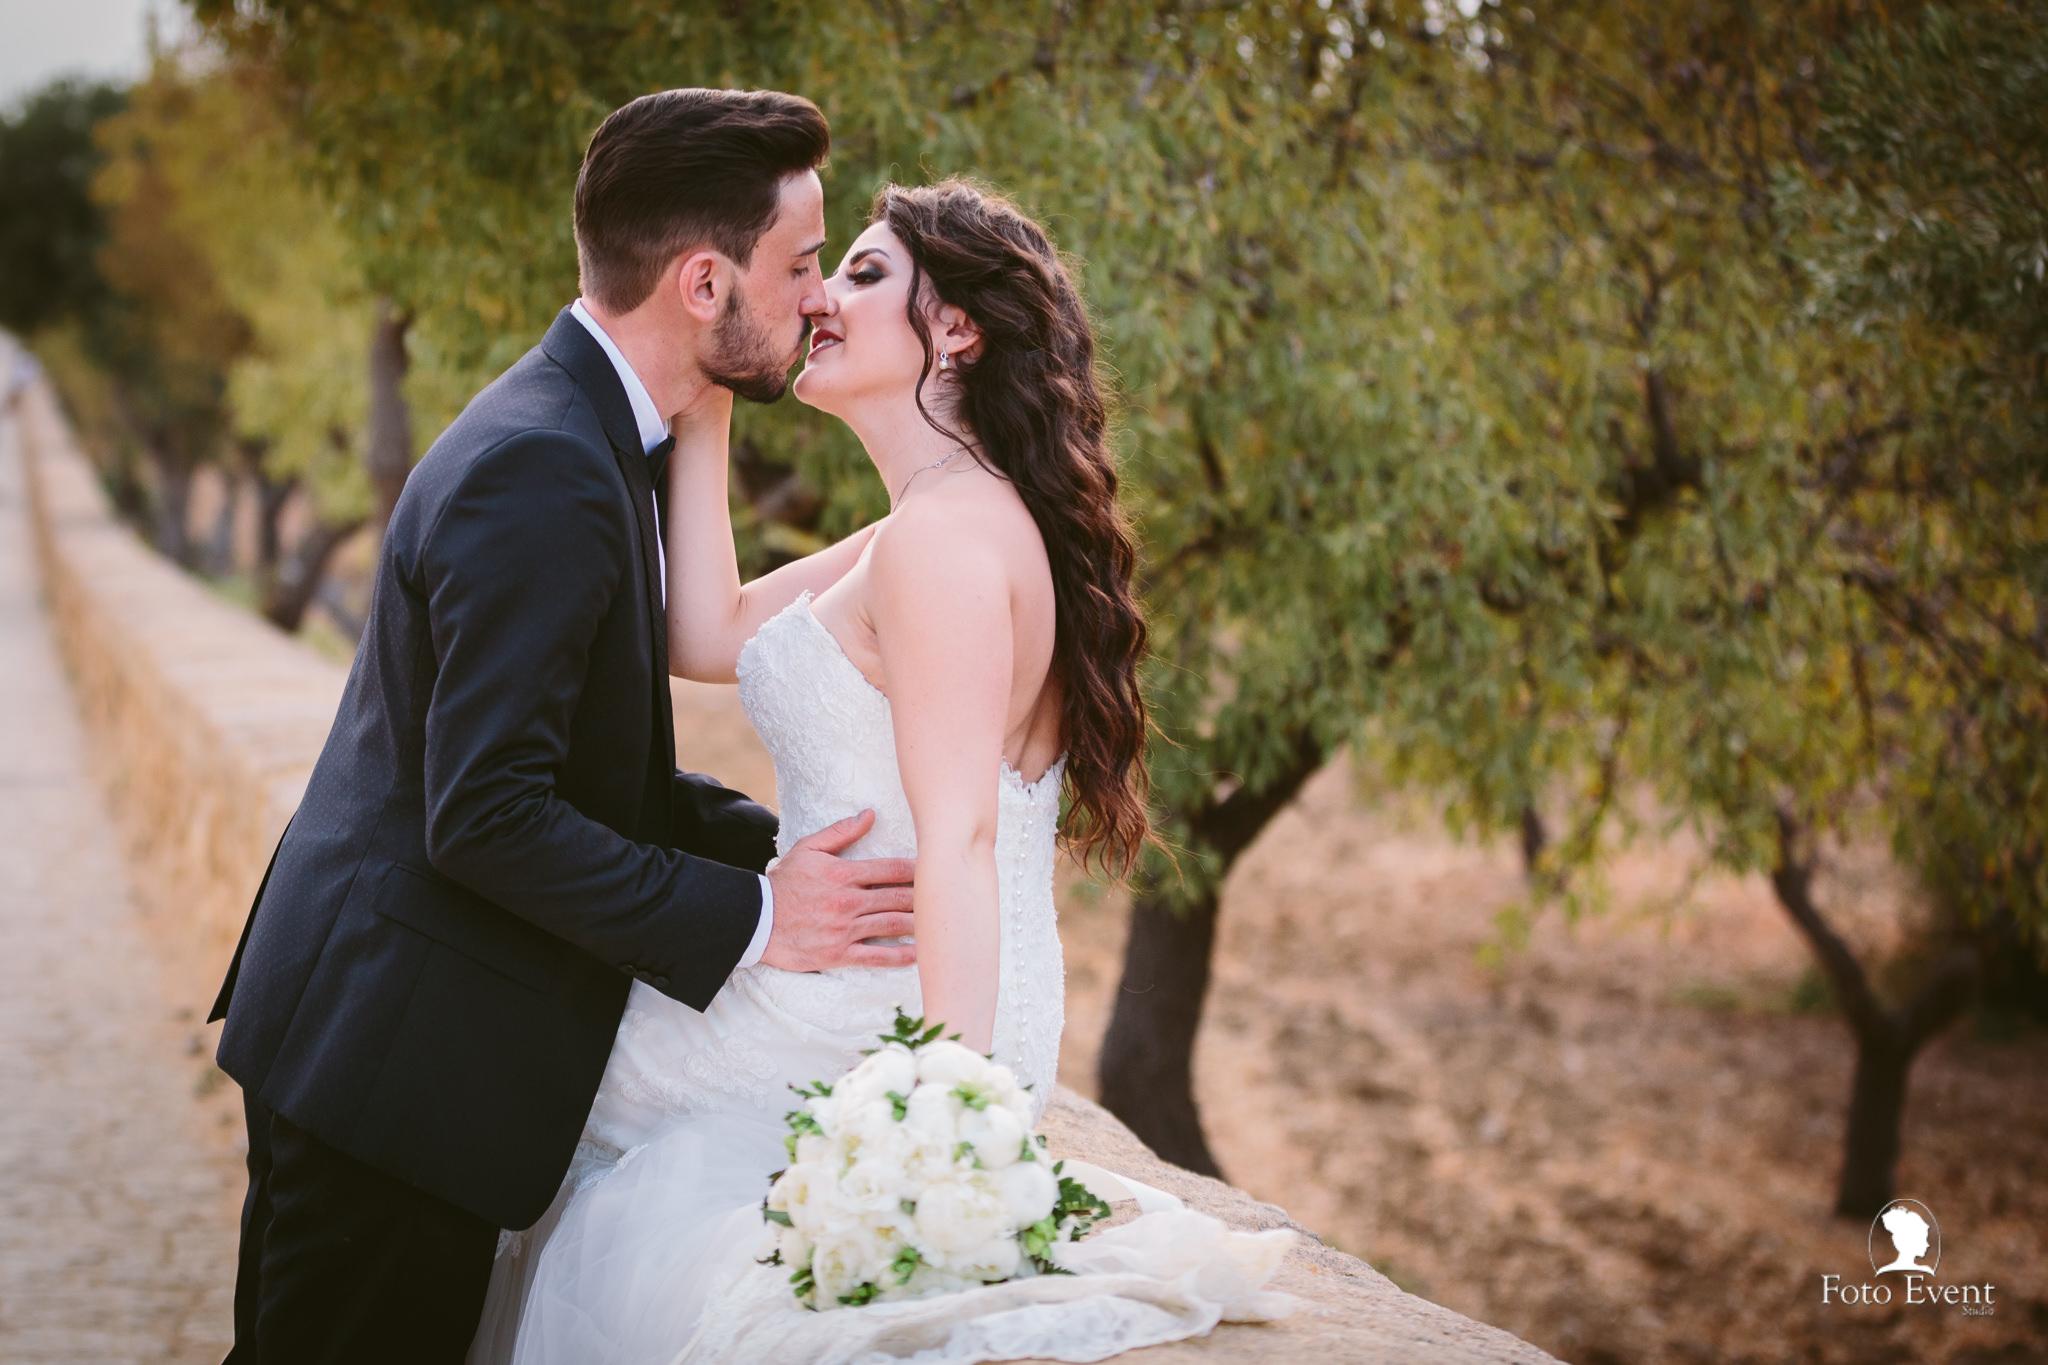 045-2019-08-31-Matrimonio-Serena-e-Saverio-Tarantino-zoom-485